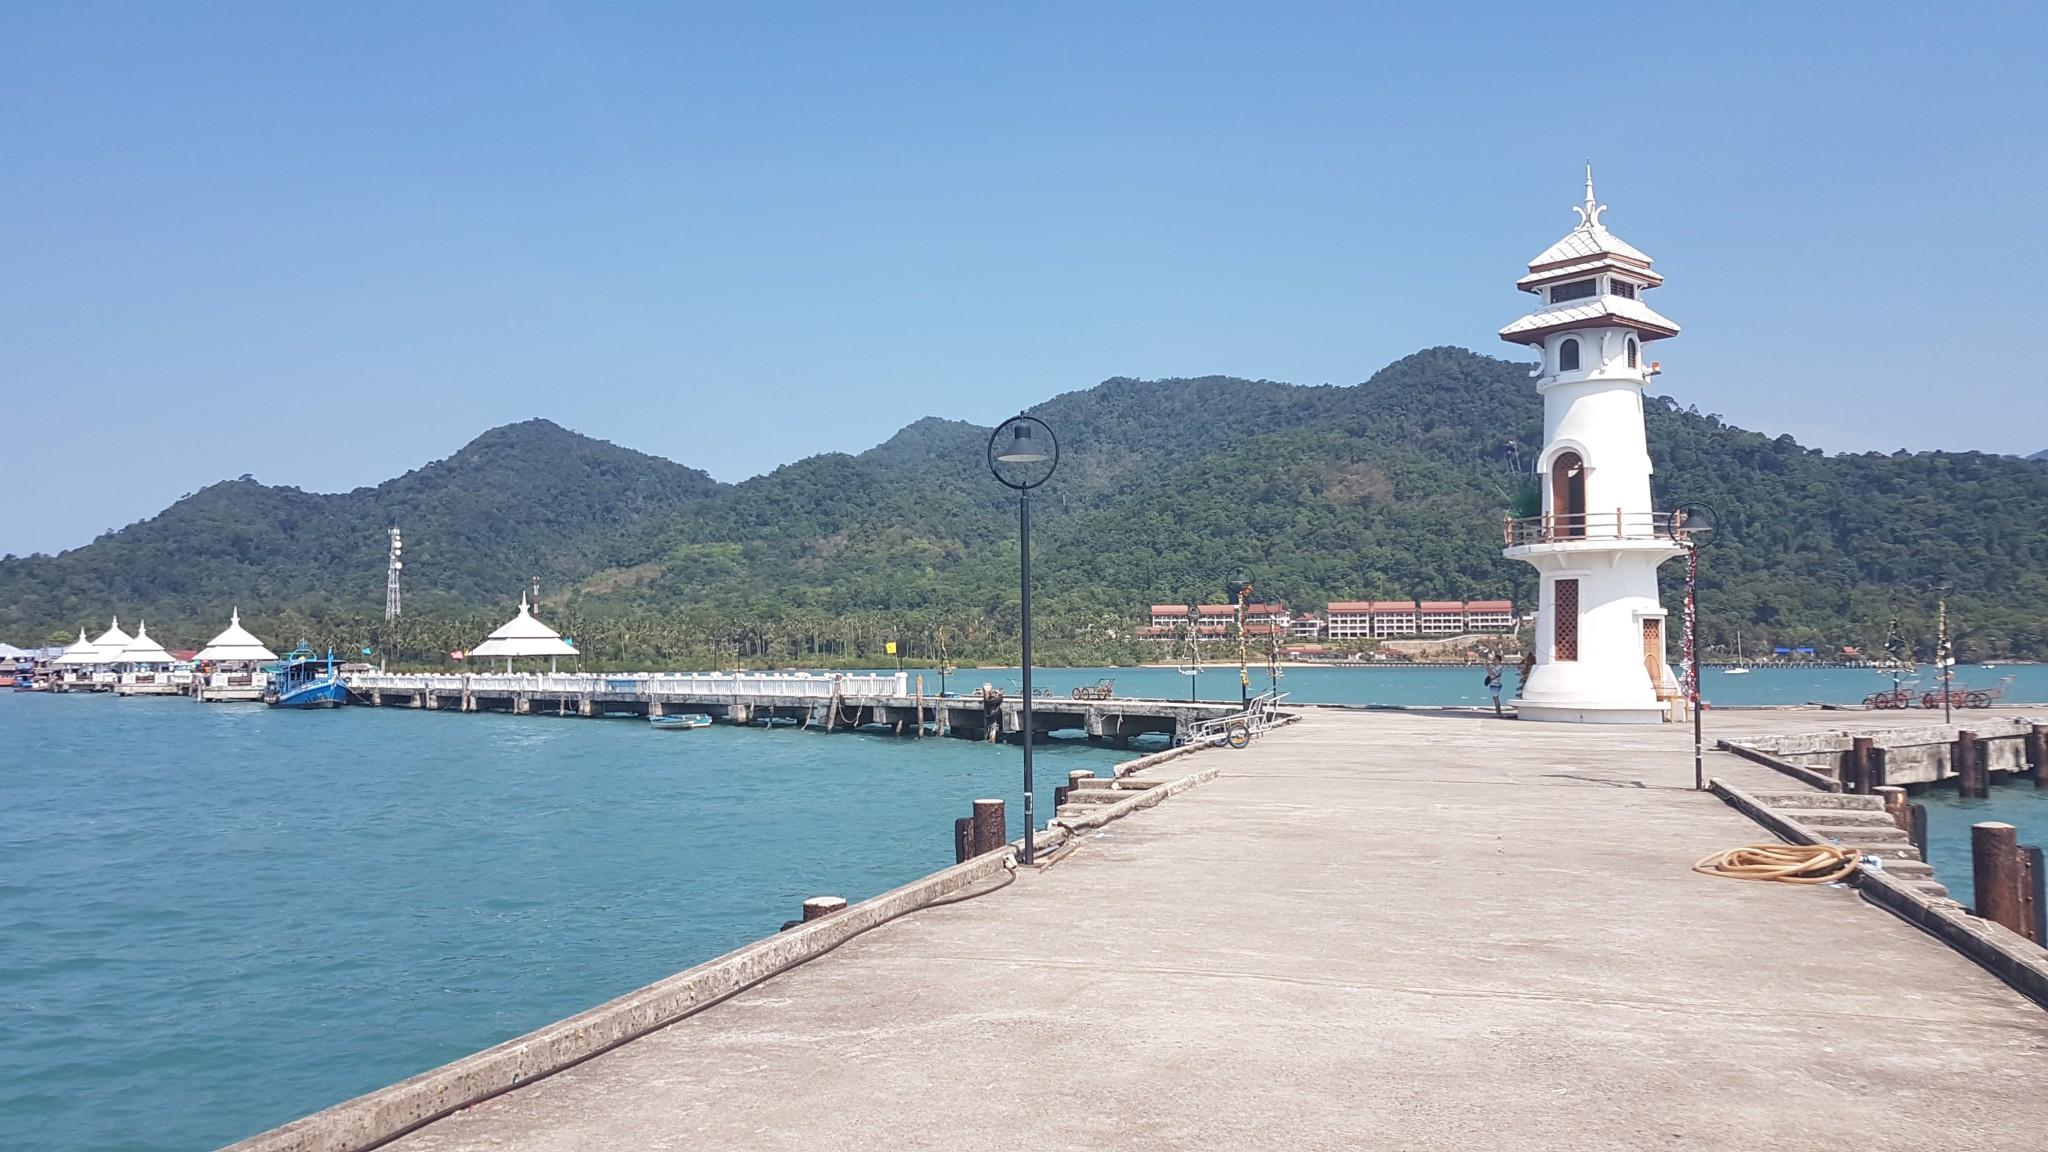 Koh Chang, Bang Bao pier, vissersdorp, Backpackjunkies